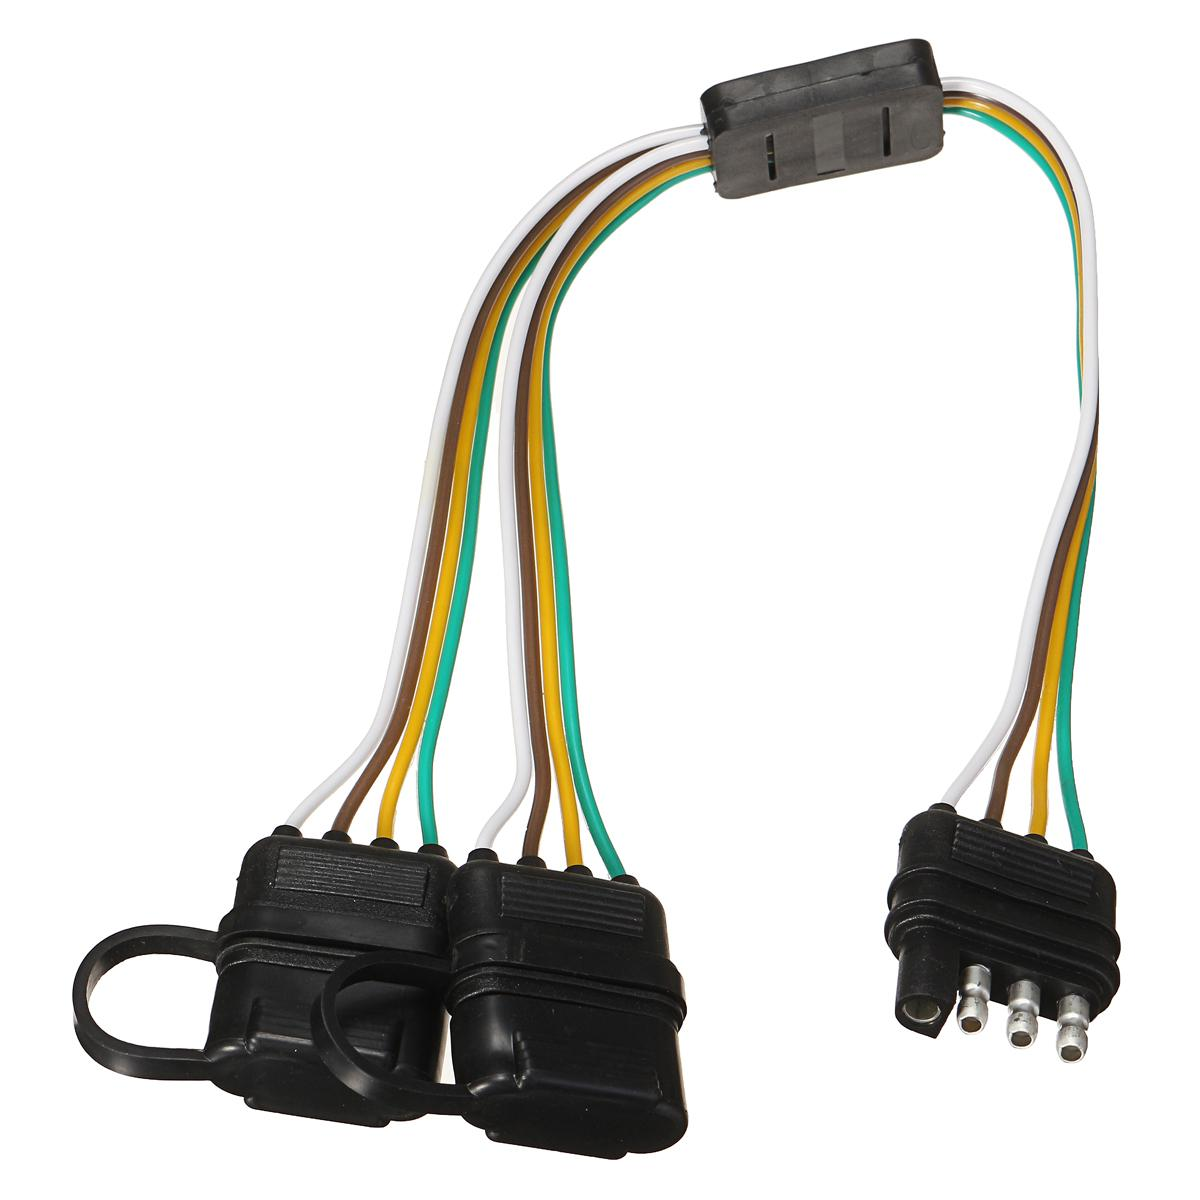 Sding Trailer Splitter 2-Way 4 Pin Y-Split Wiring Harness Adapter for on